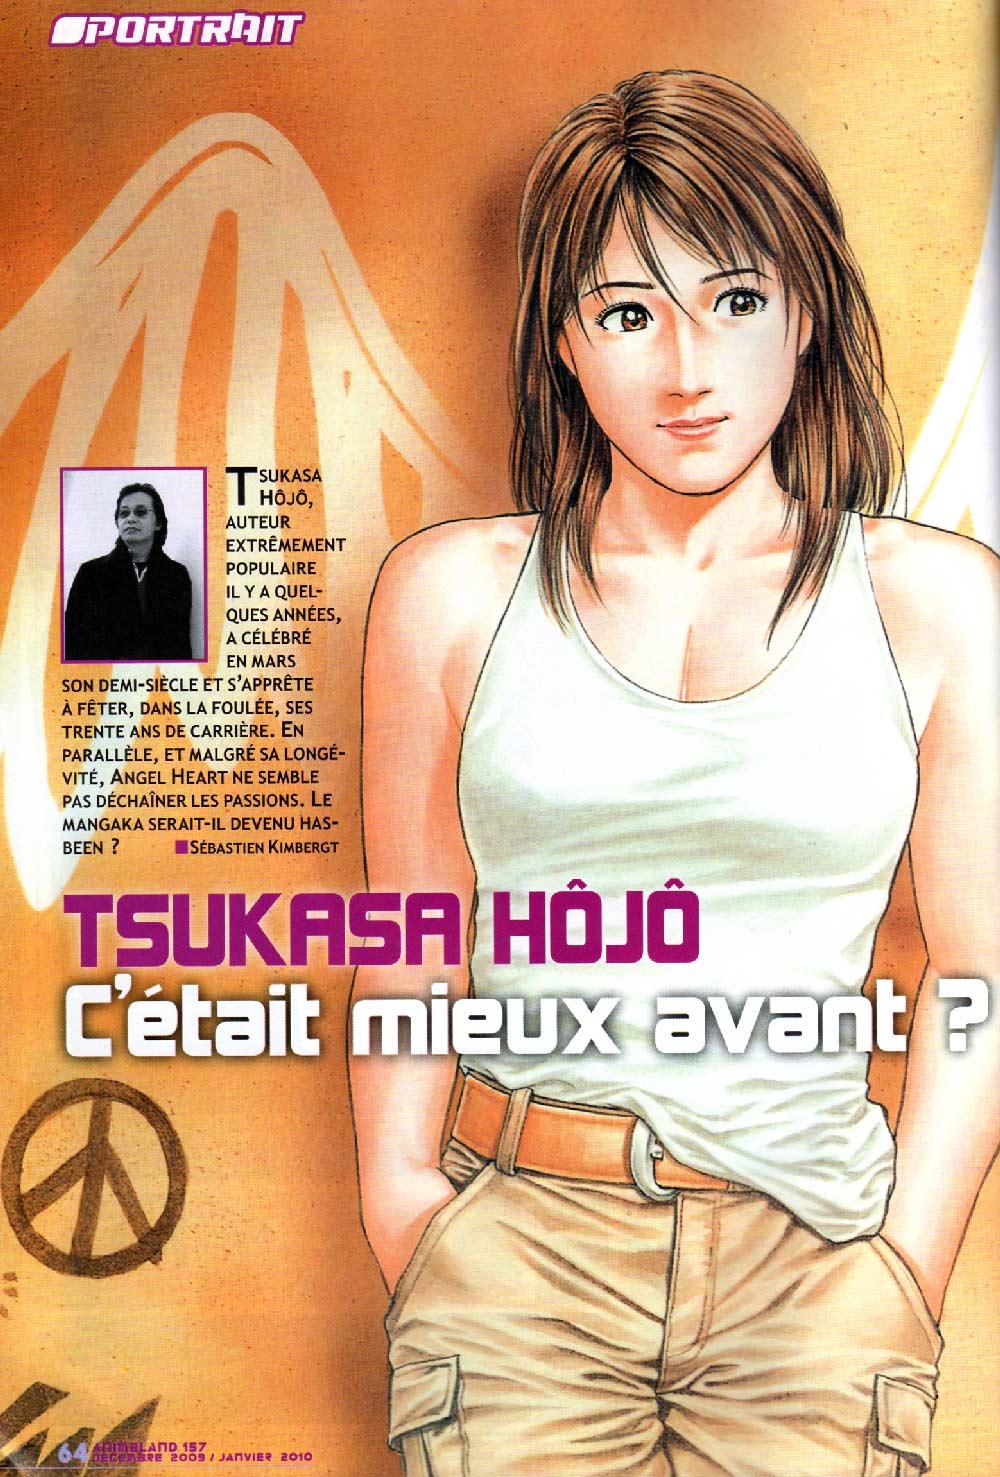 Animeland 157 page 64 Tsukasa Hojo